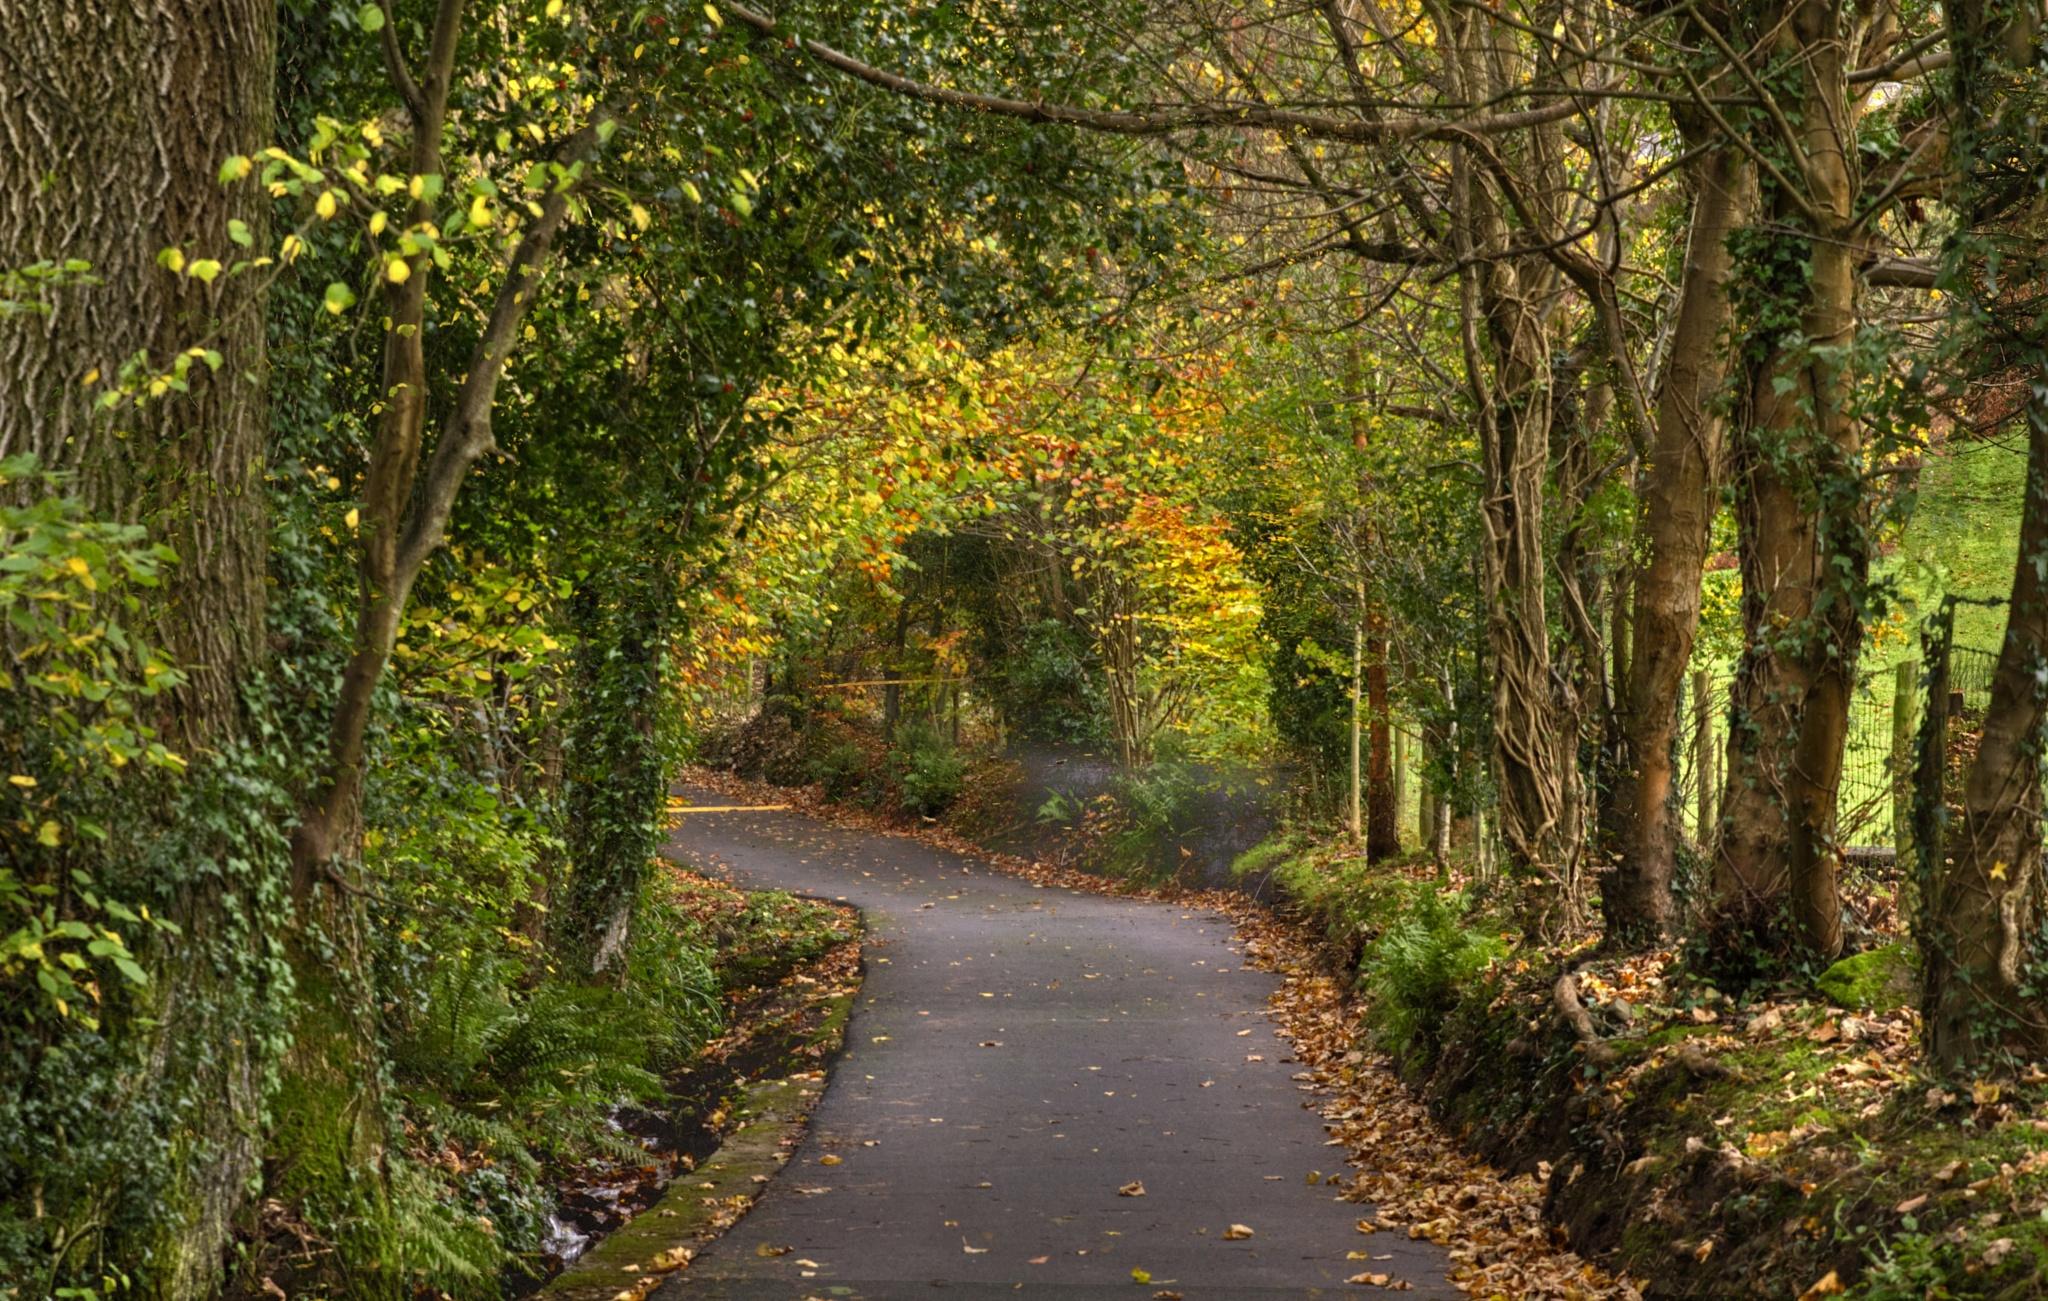 Country Lane by Delwyn Edwards